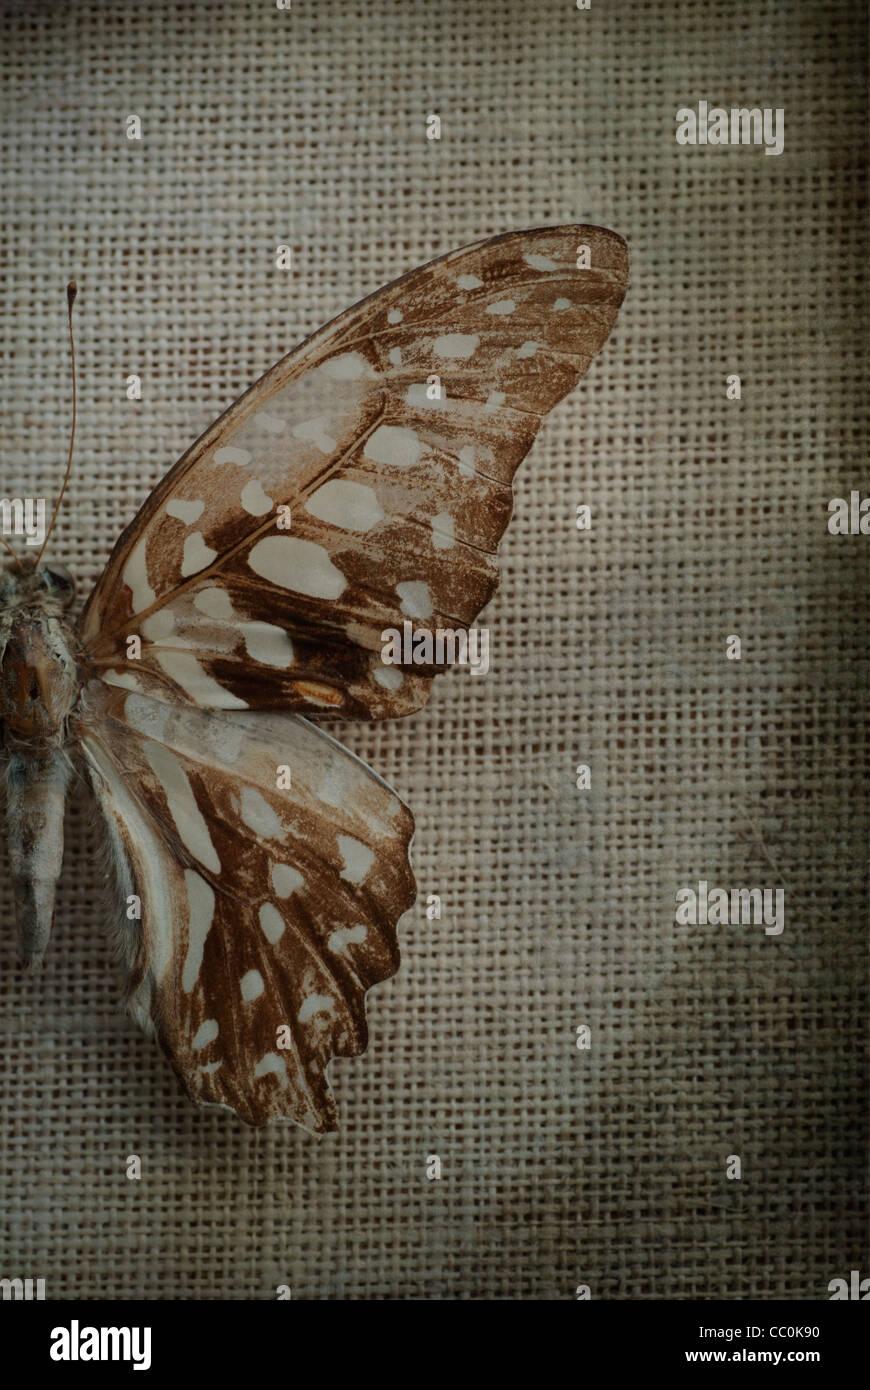 Detalle de un ala de mariposa en seco Imagen De Stock